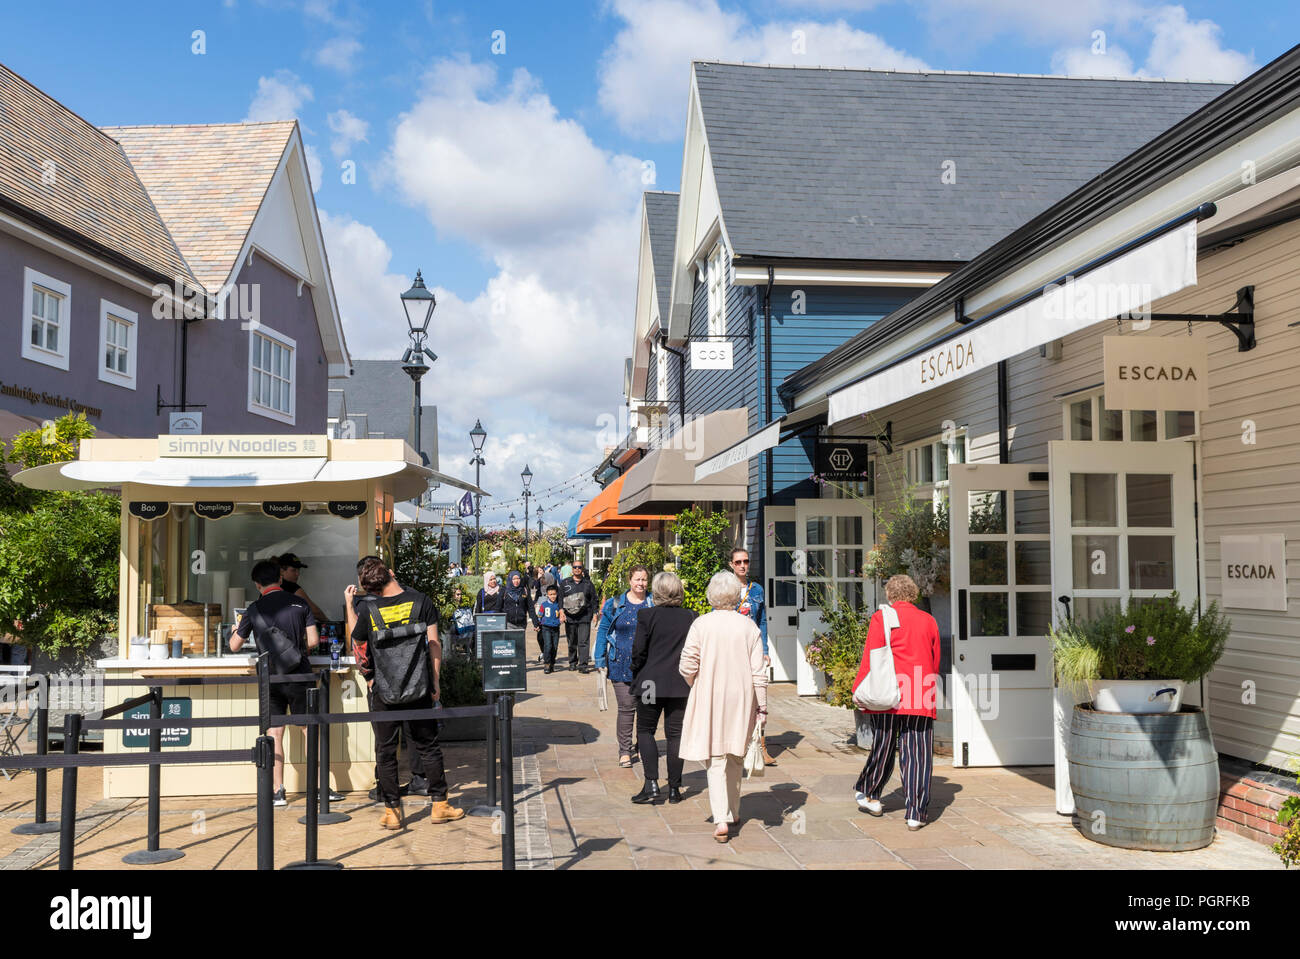 Bicester shopping village bicester village designer outlet mall bicester  oxfordshire england uk gb europe 8c88f60f0a914